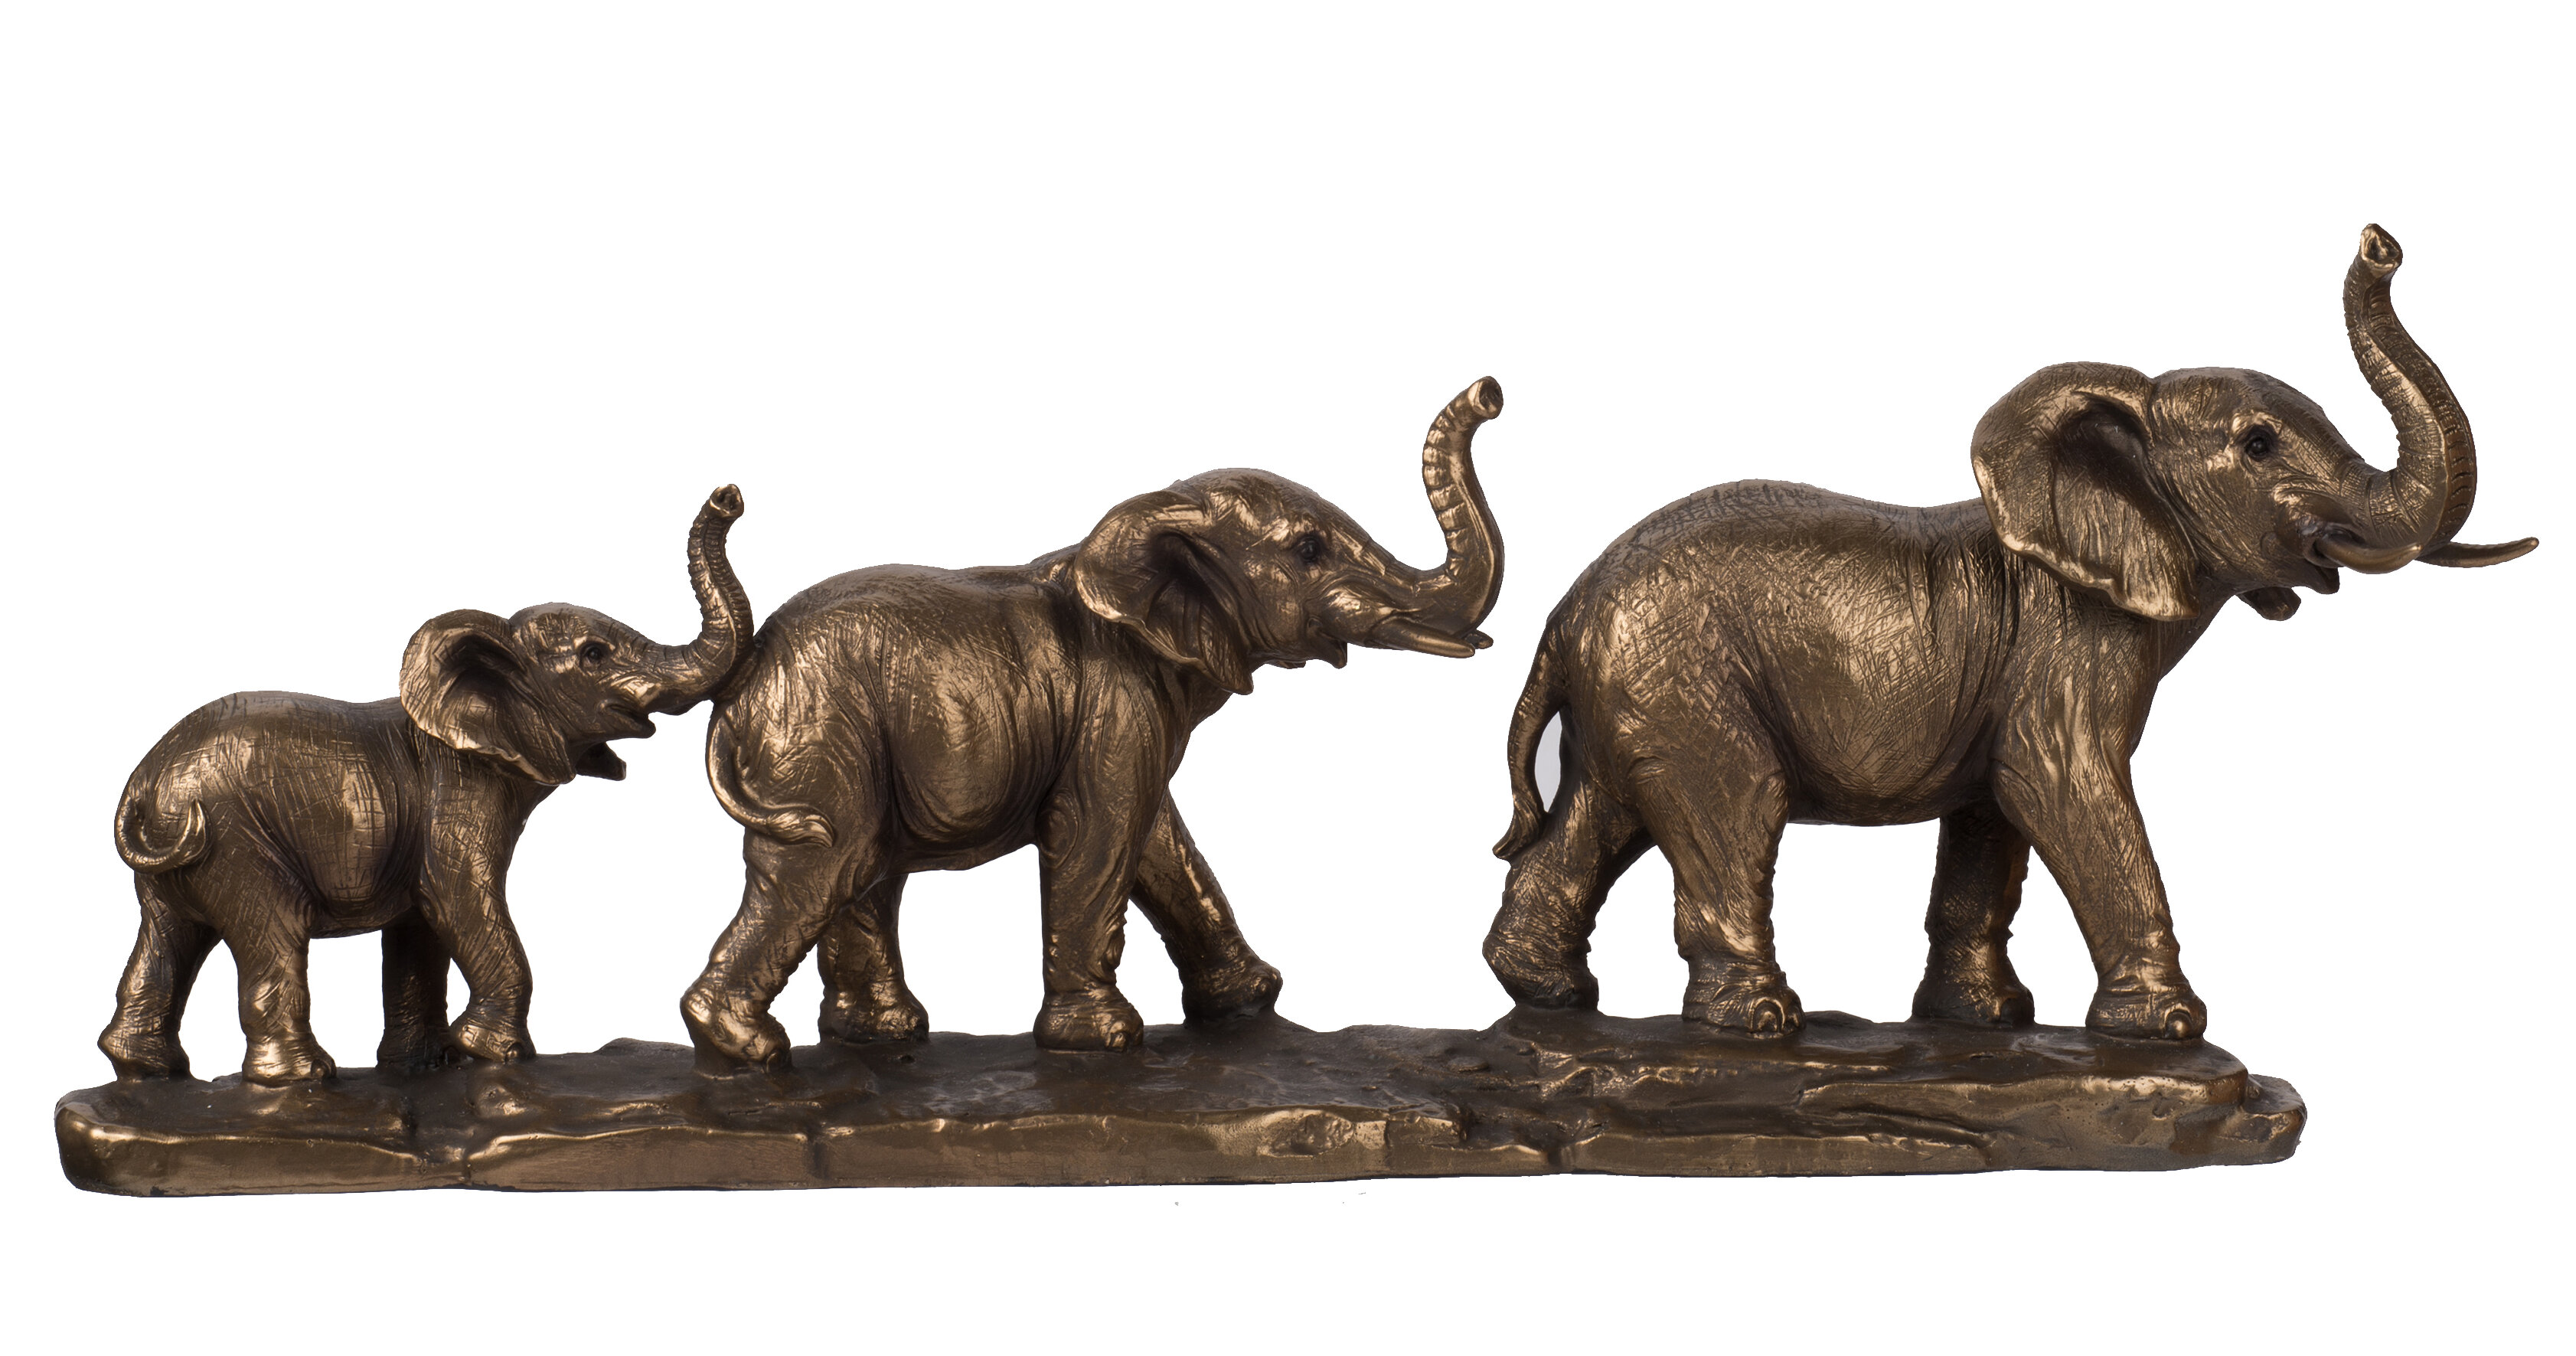 World Menagerie Chavez Elephant Family Figurine Wayfair